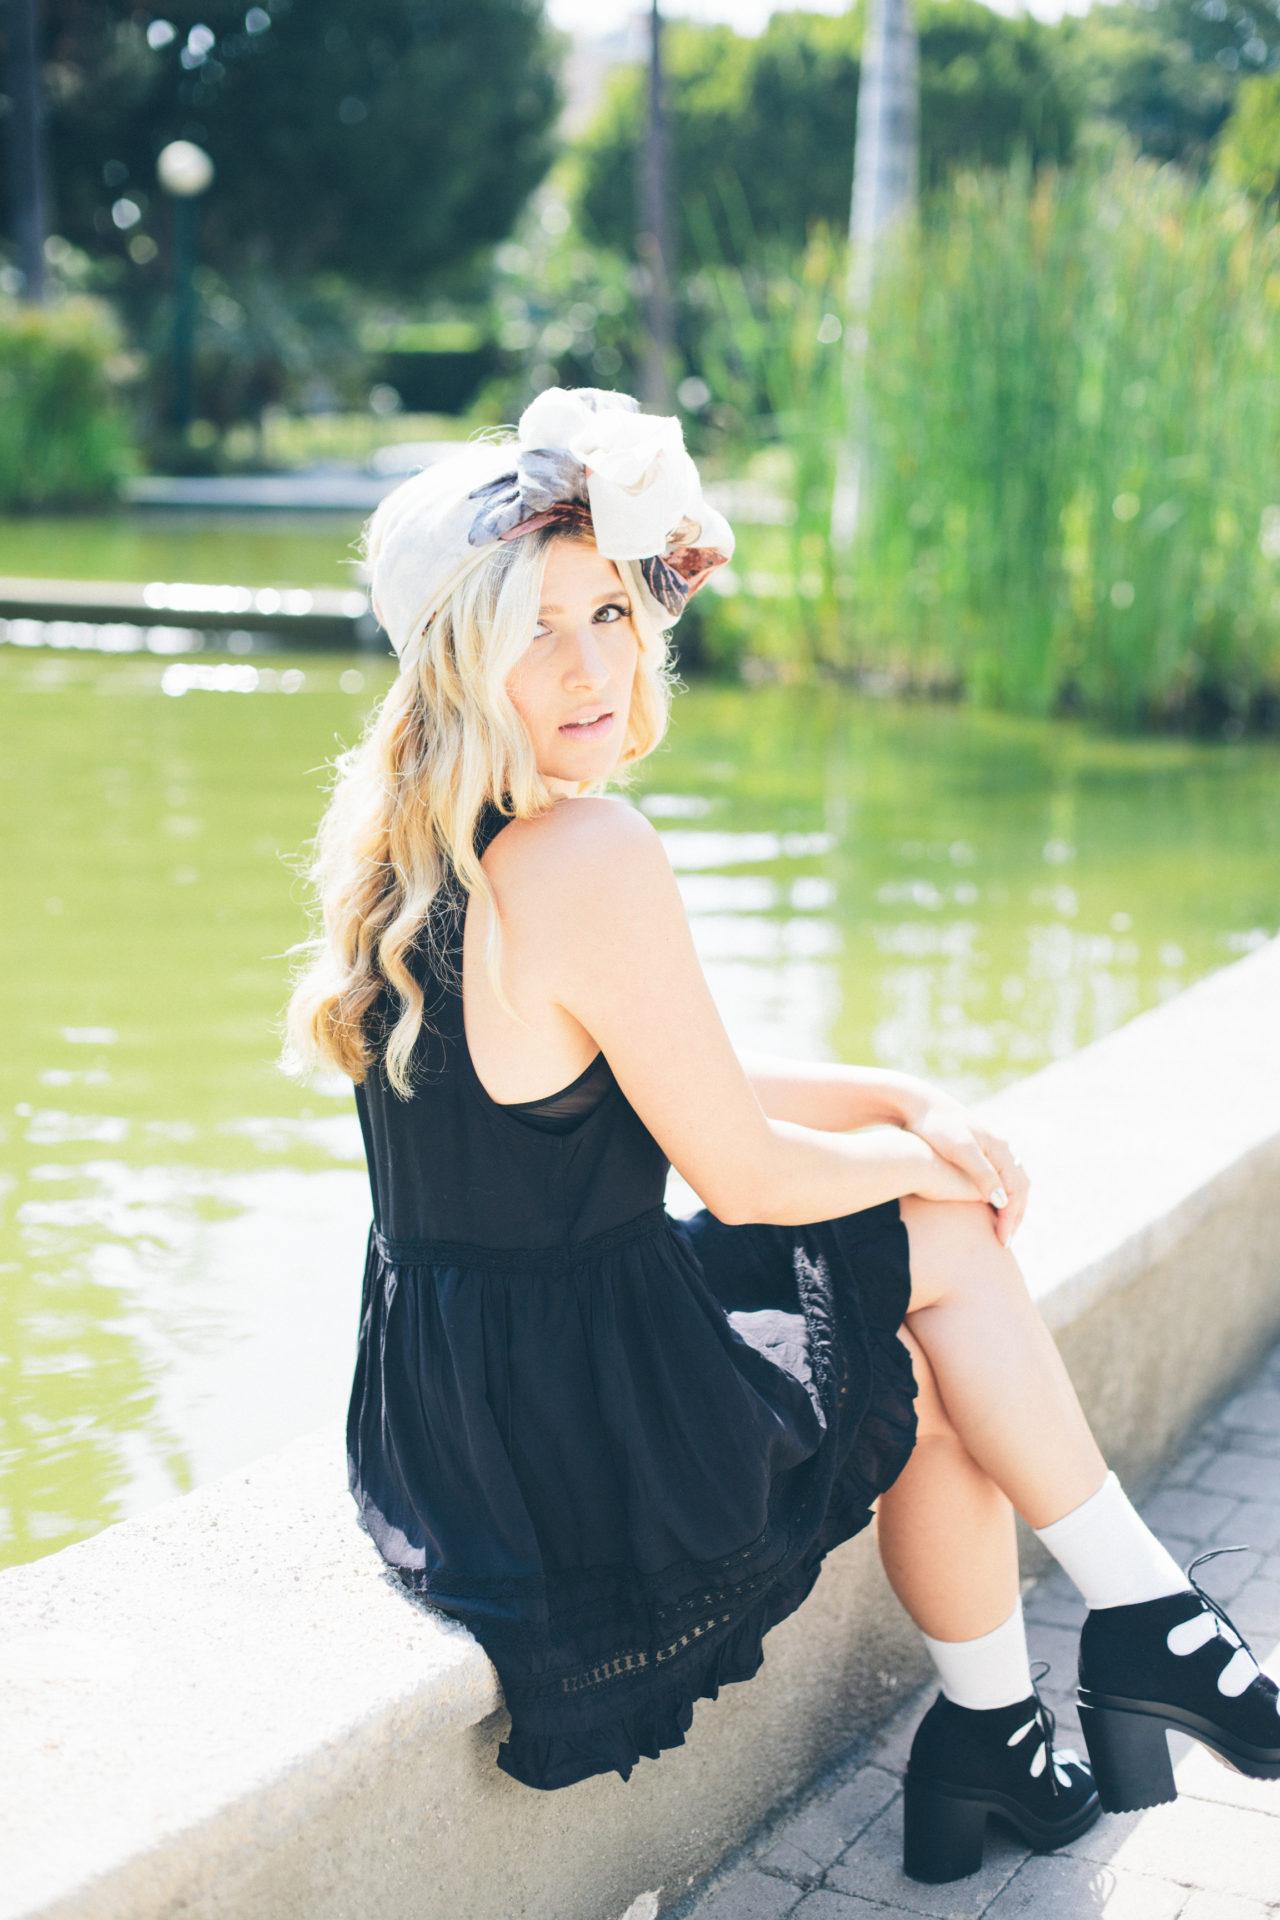 MrKate_TARGET_Beauty_JUNE (103 of 163)